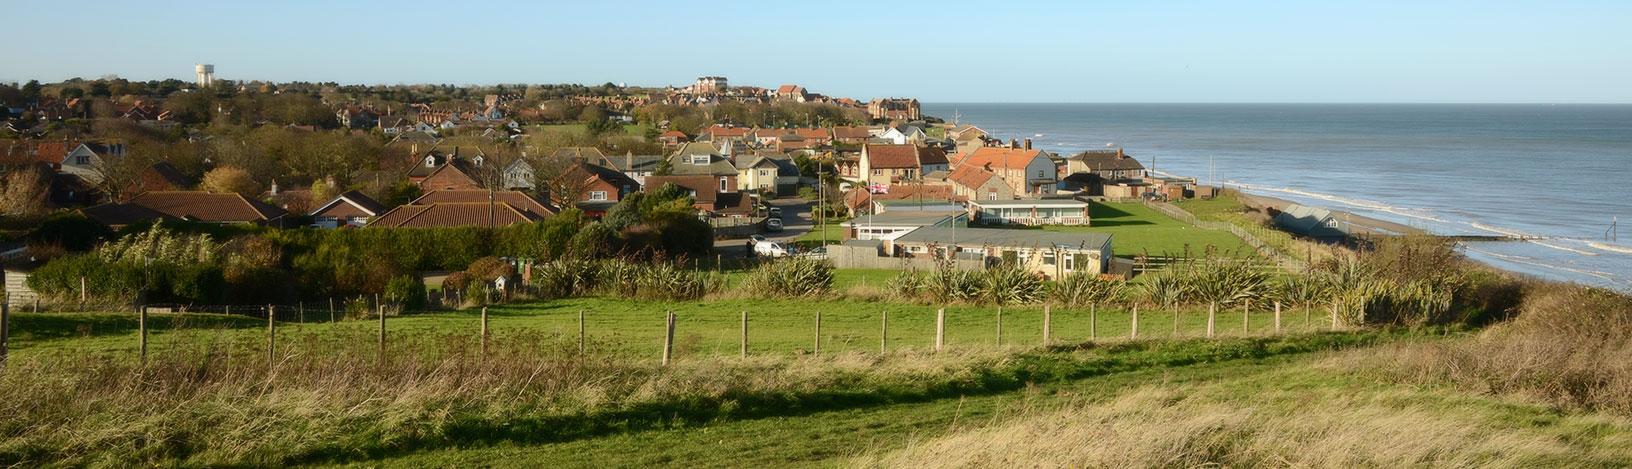 Mundesley, Norfolk (from east)